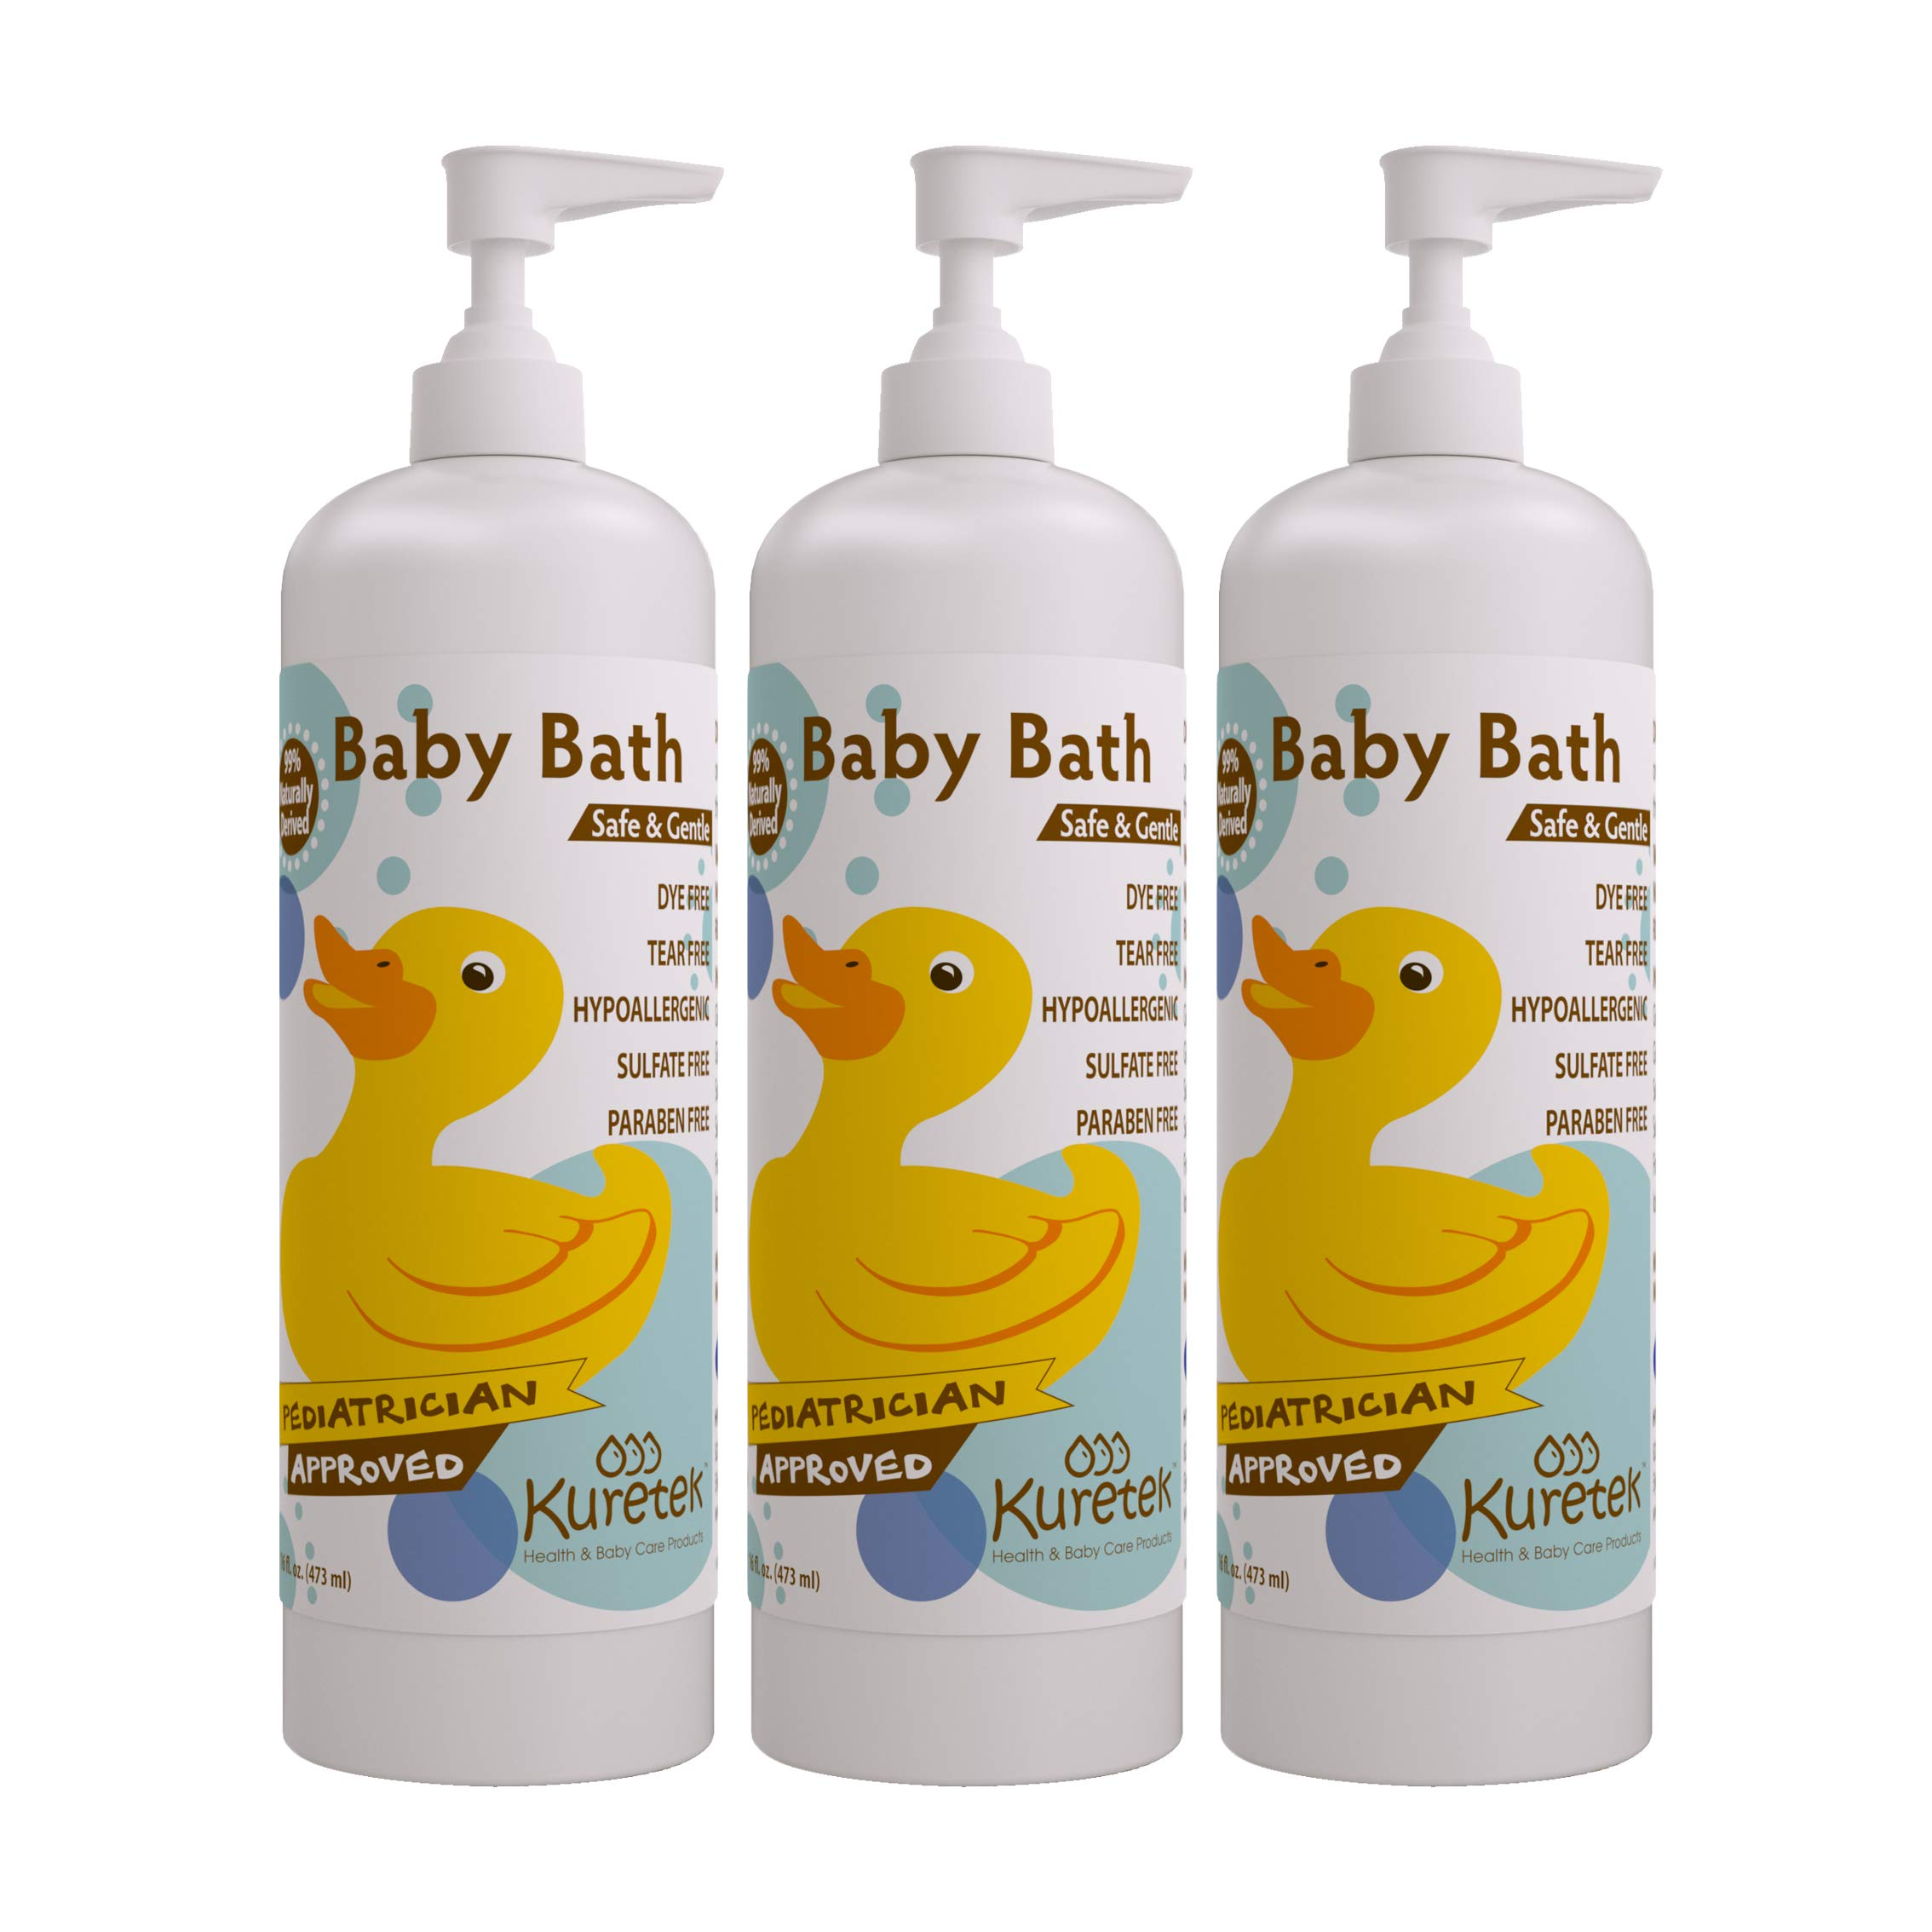 Kuretek Safe & Gentle Baby Bath, Pediatrician Approved, Hypoallergenic, Tear-Free, 16 ounces (3-pack) by Kuretek